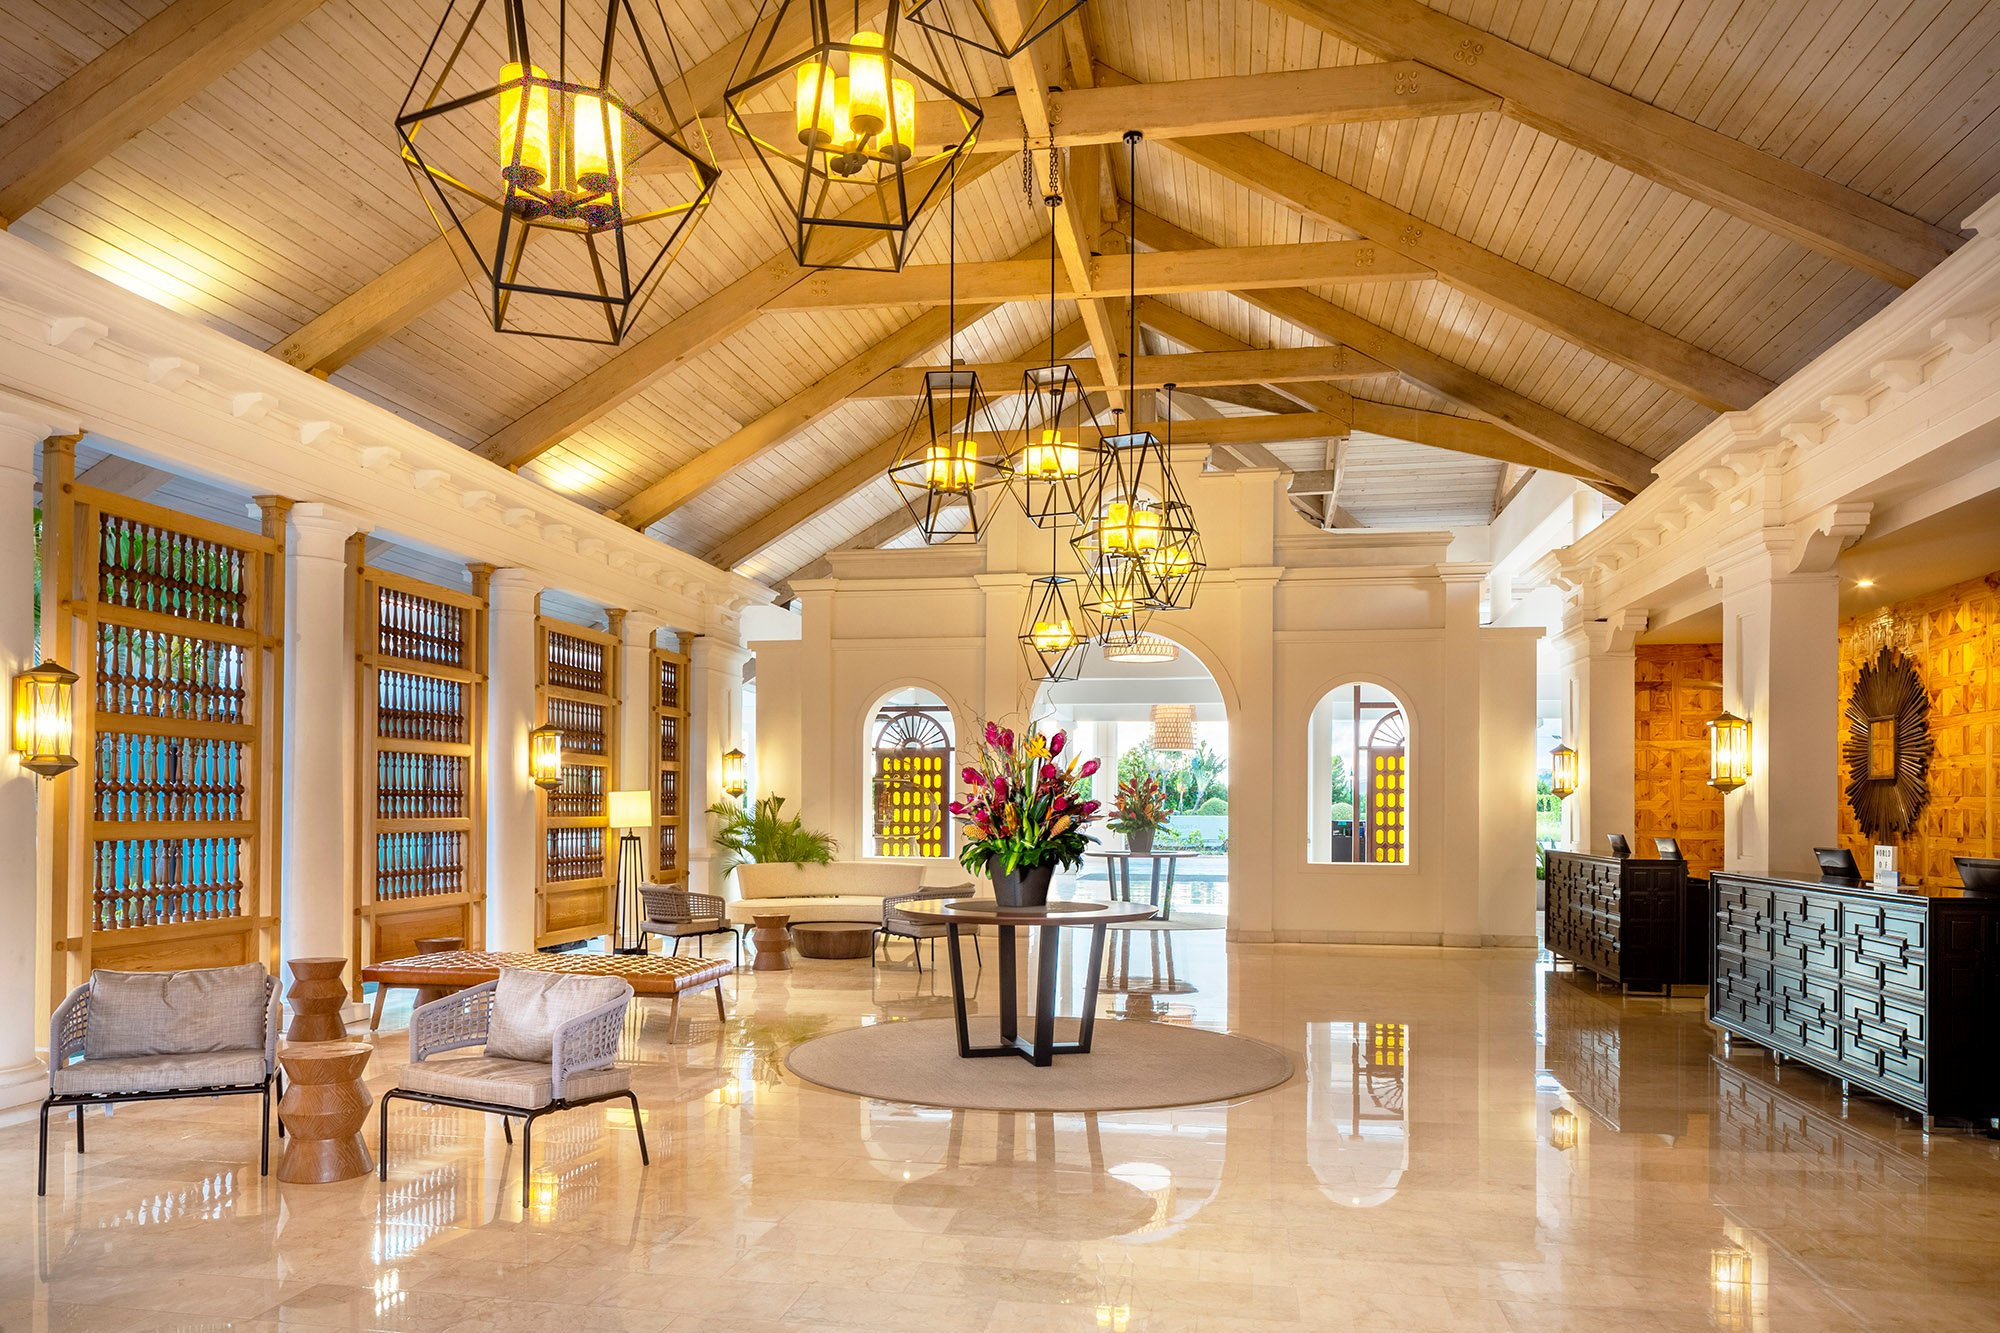 The Hyatt Regency Grand Reserve Puerto Rico is the closest full-service luxury resort to the San Juan International Airport.